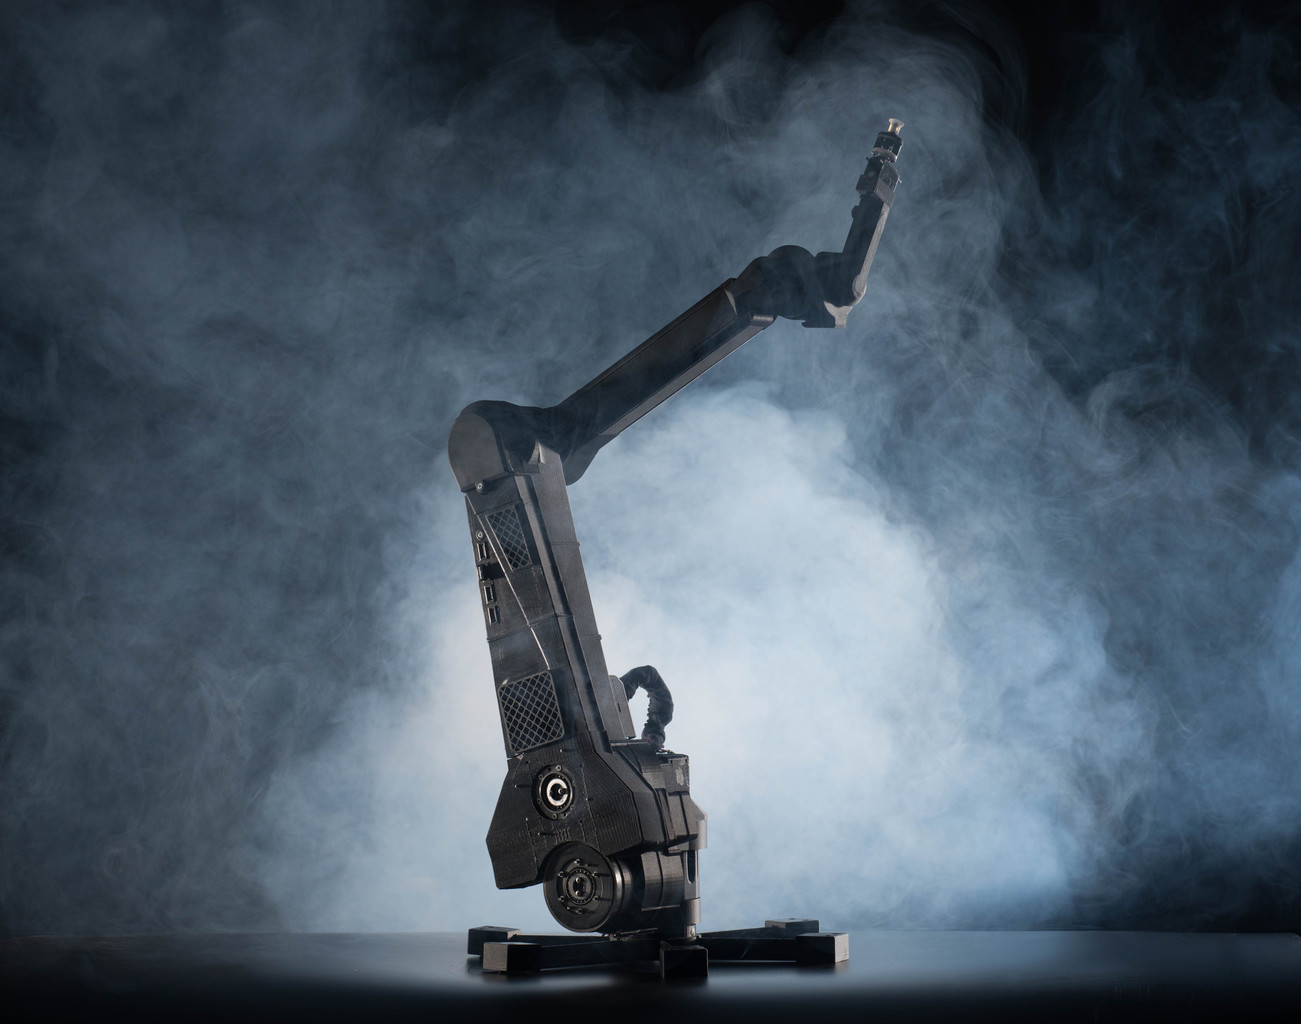 Haddington Dynamics Increases Quality of 3D Printed Robot